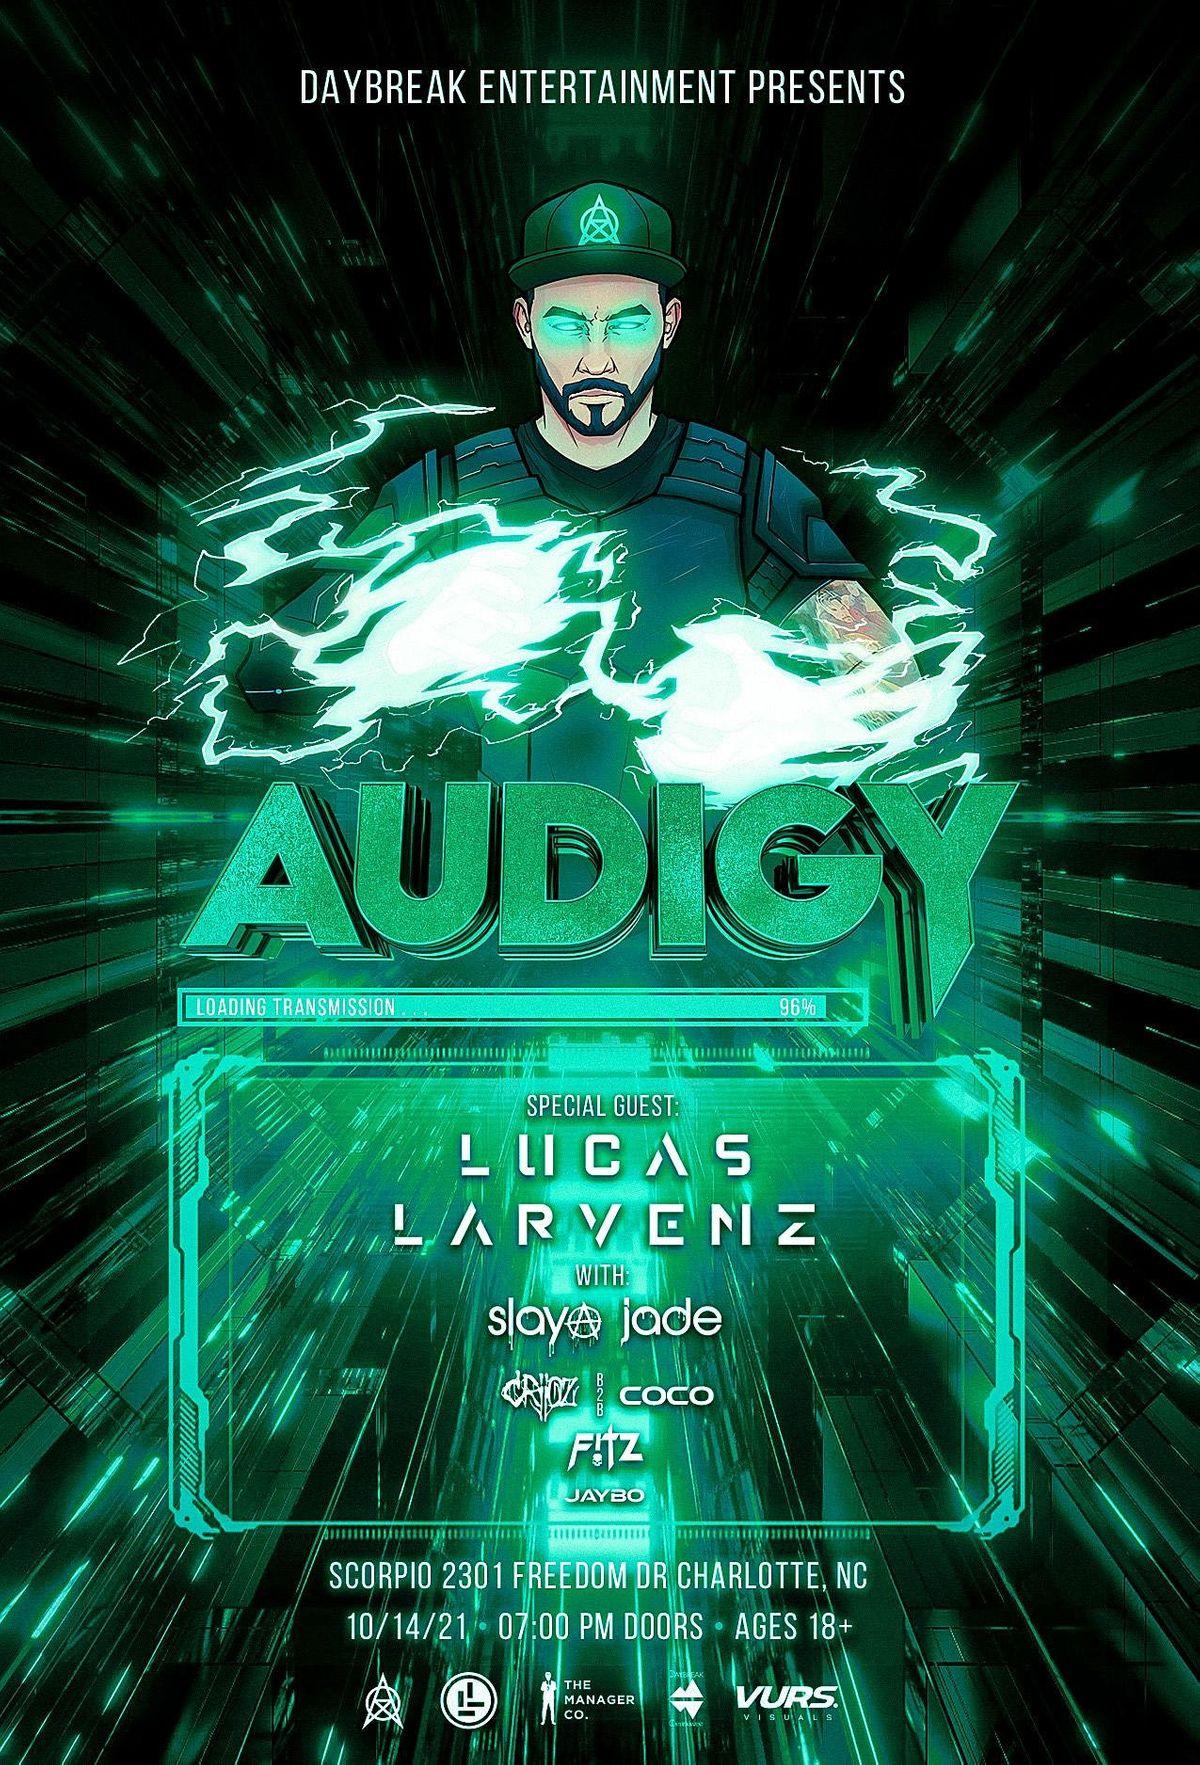 Audigy w\/ Special Guest Lucas Larvenz